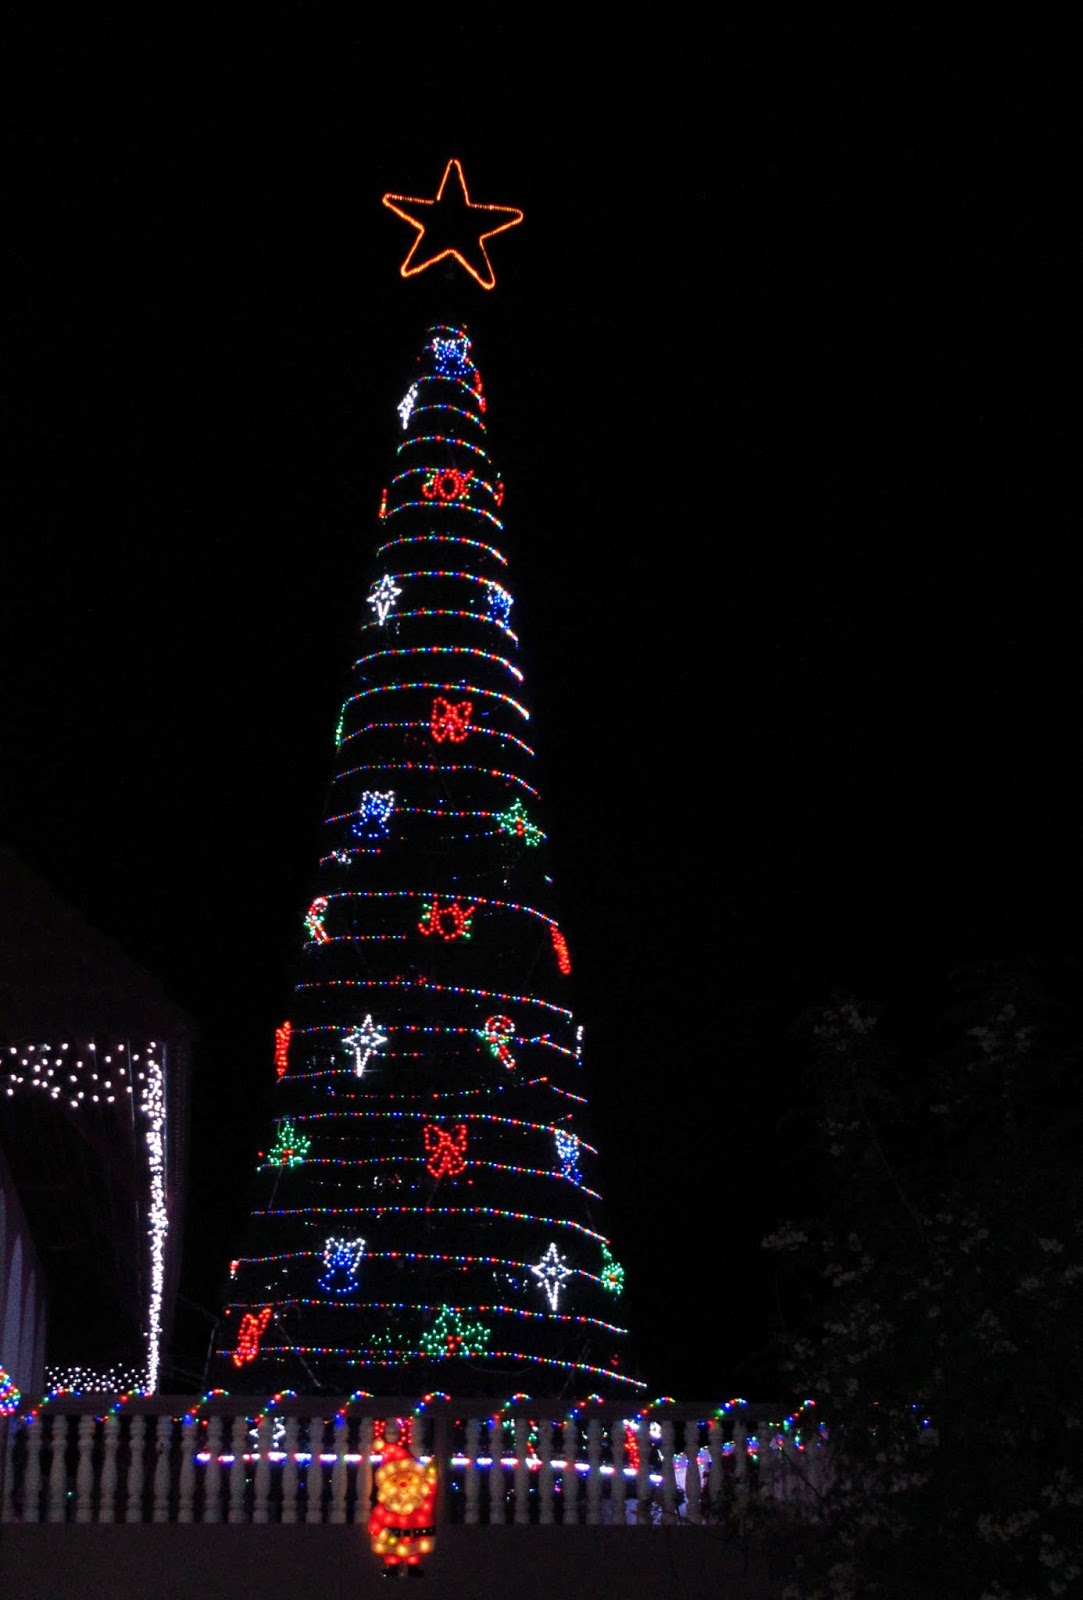 ms nancys tree - Simply Having A Wonderful Christmas Time